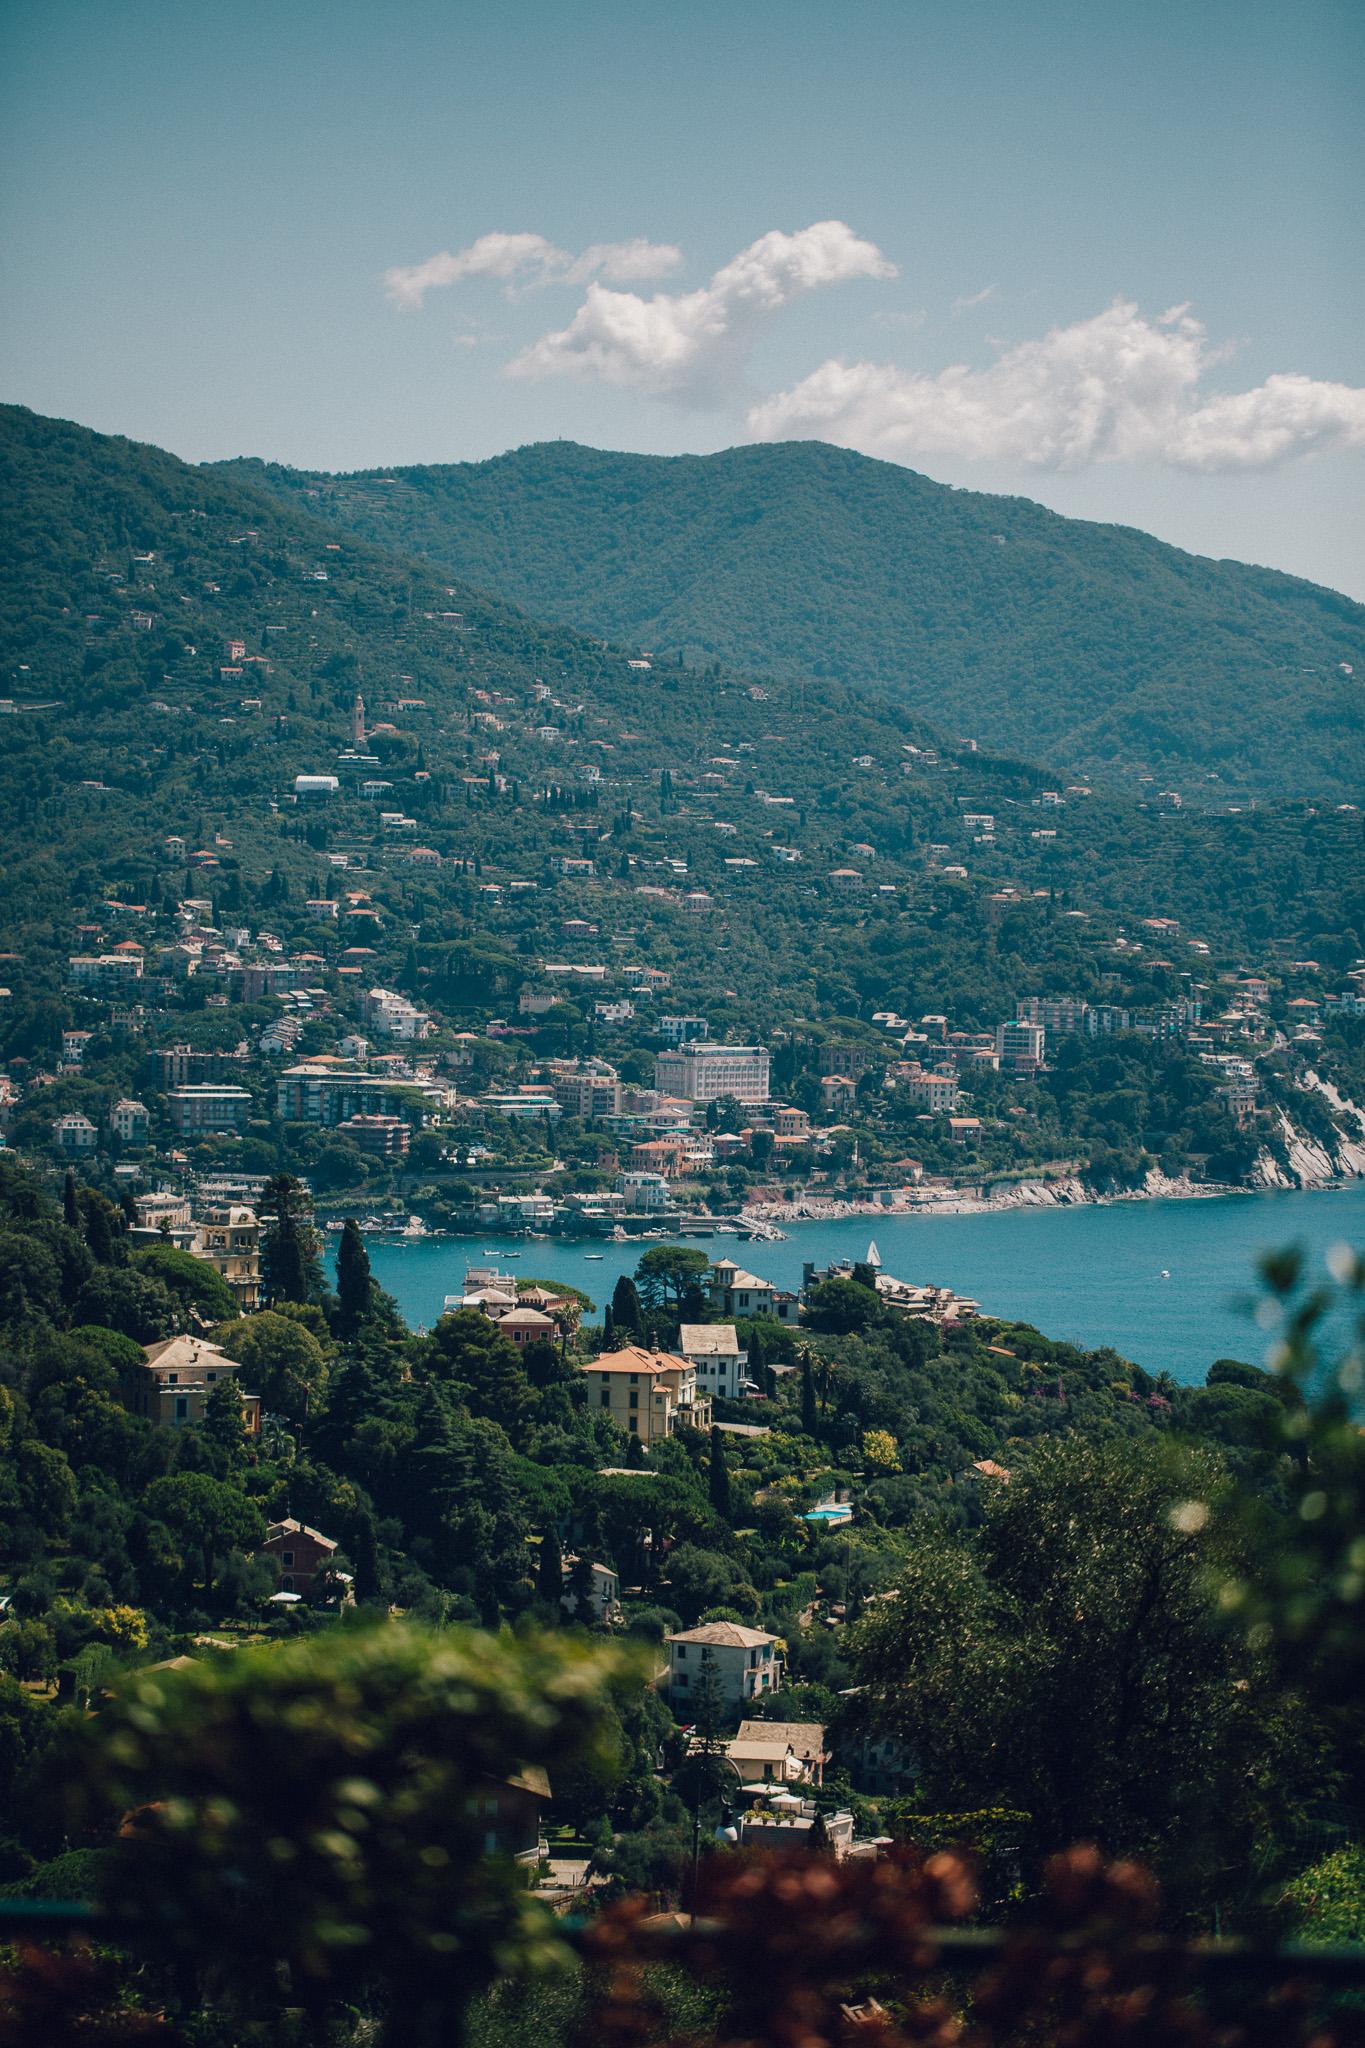 190807-Rapallo-3765.jpg